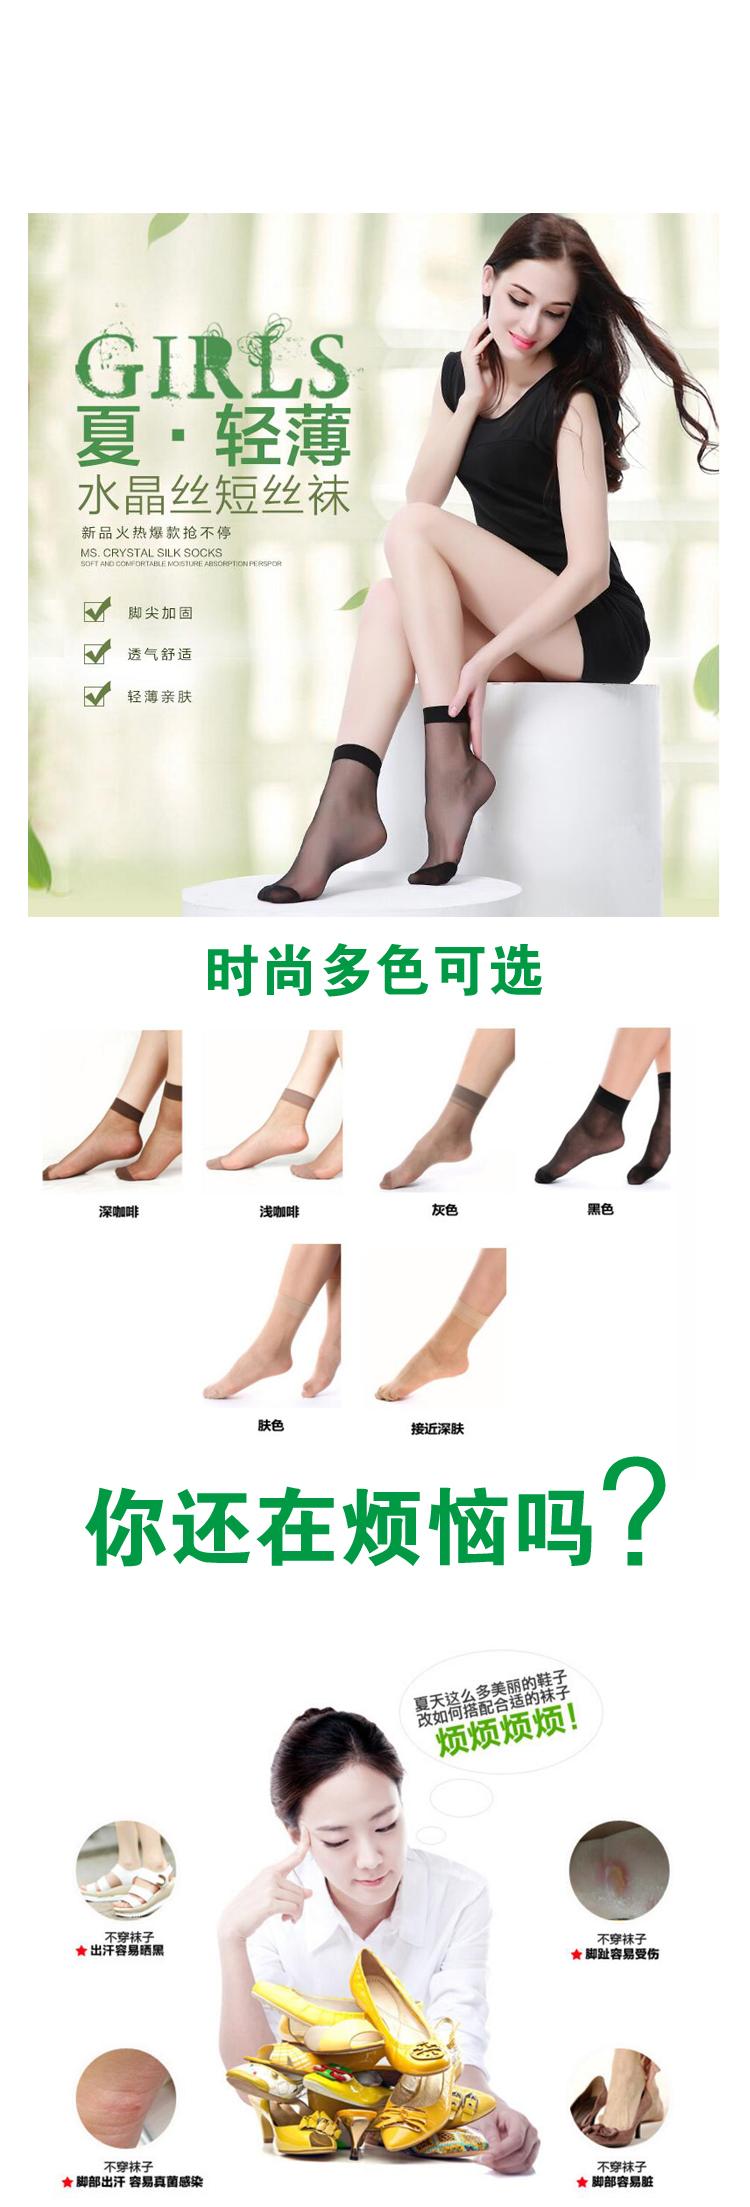 Z216浪莎5双装包芯丝短丝袜女防勾丝女士夏季薄款丝袜子女超薄肉色丝袜短袜图片